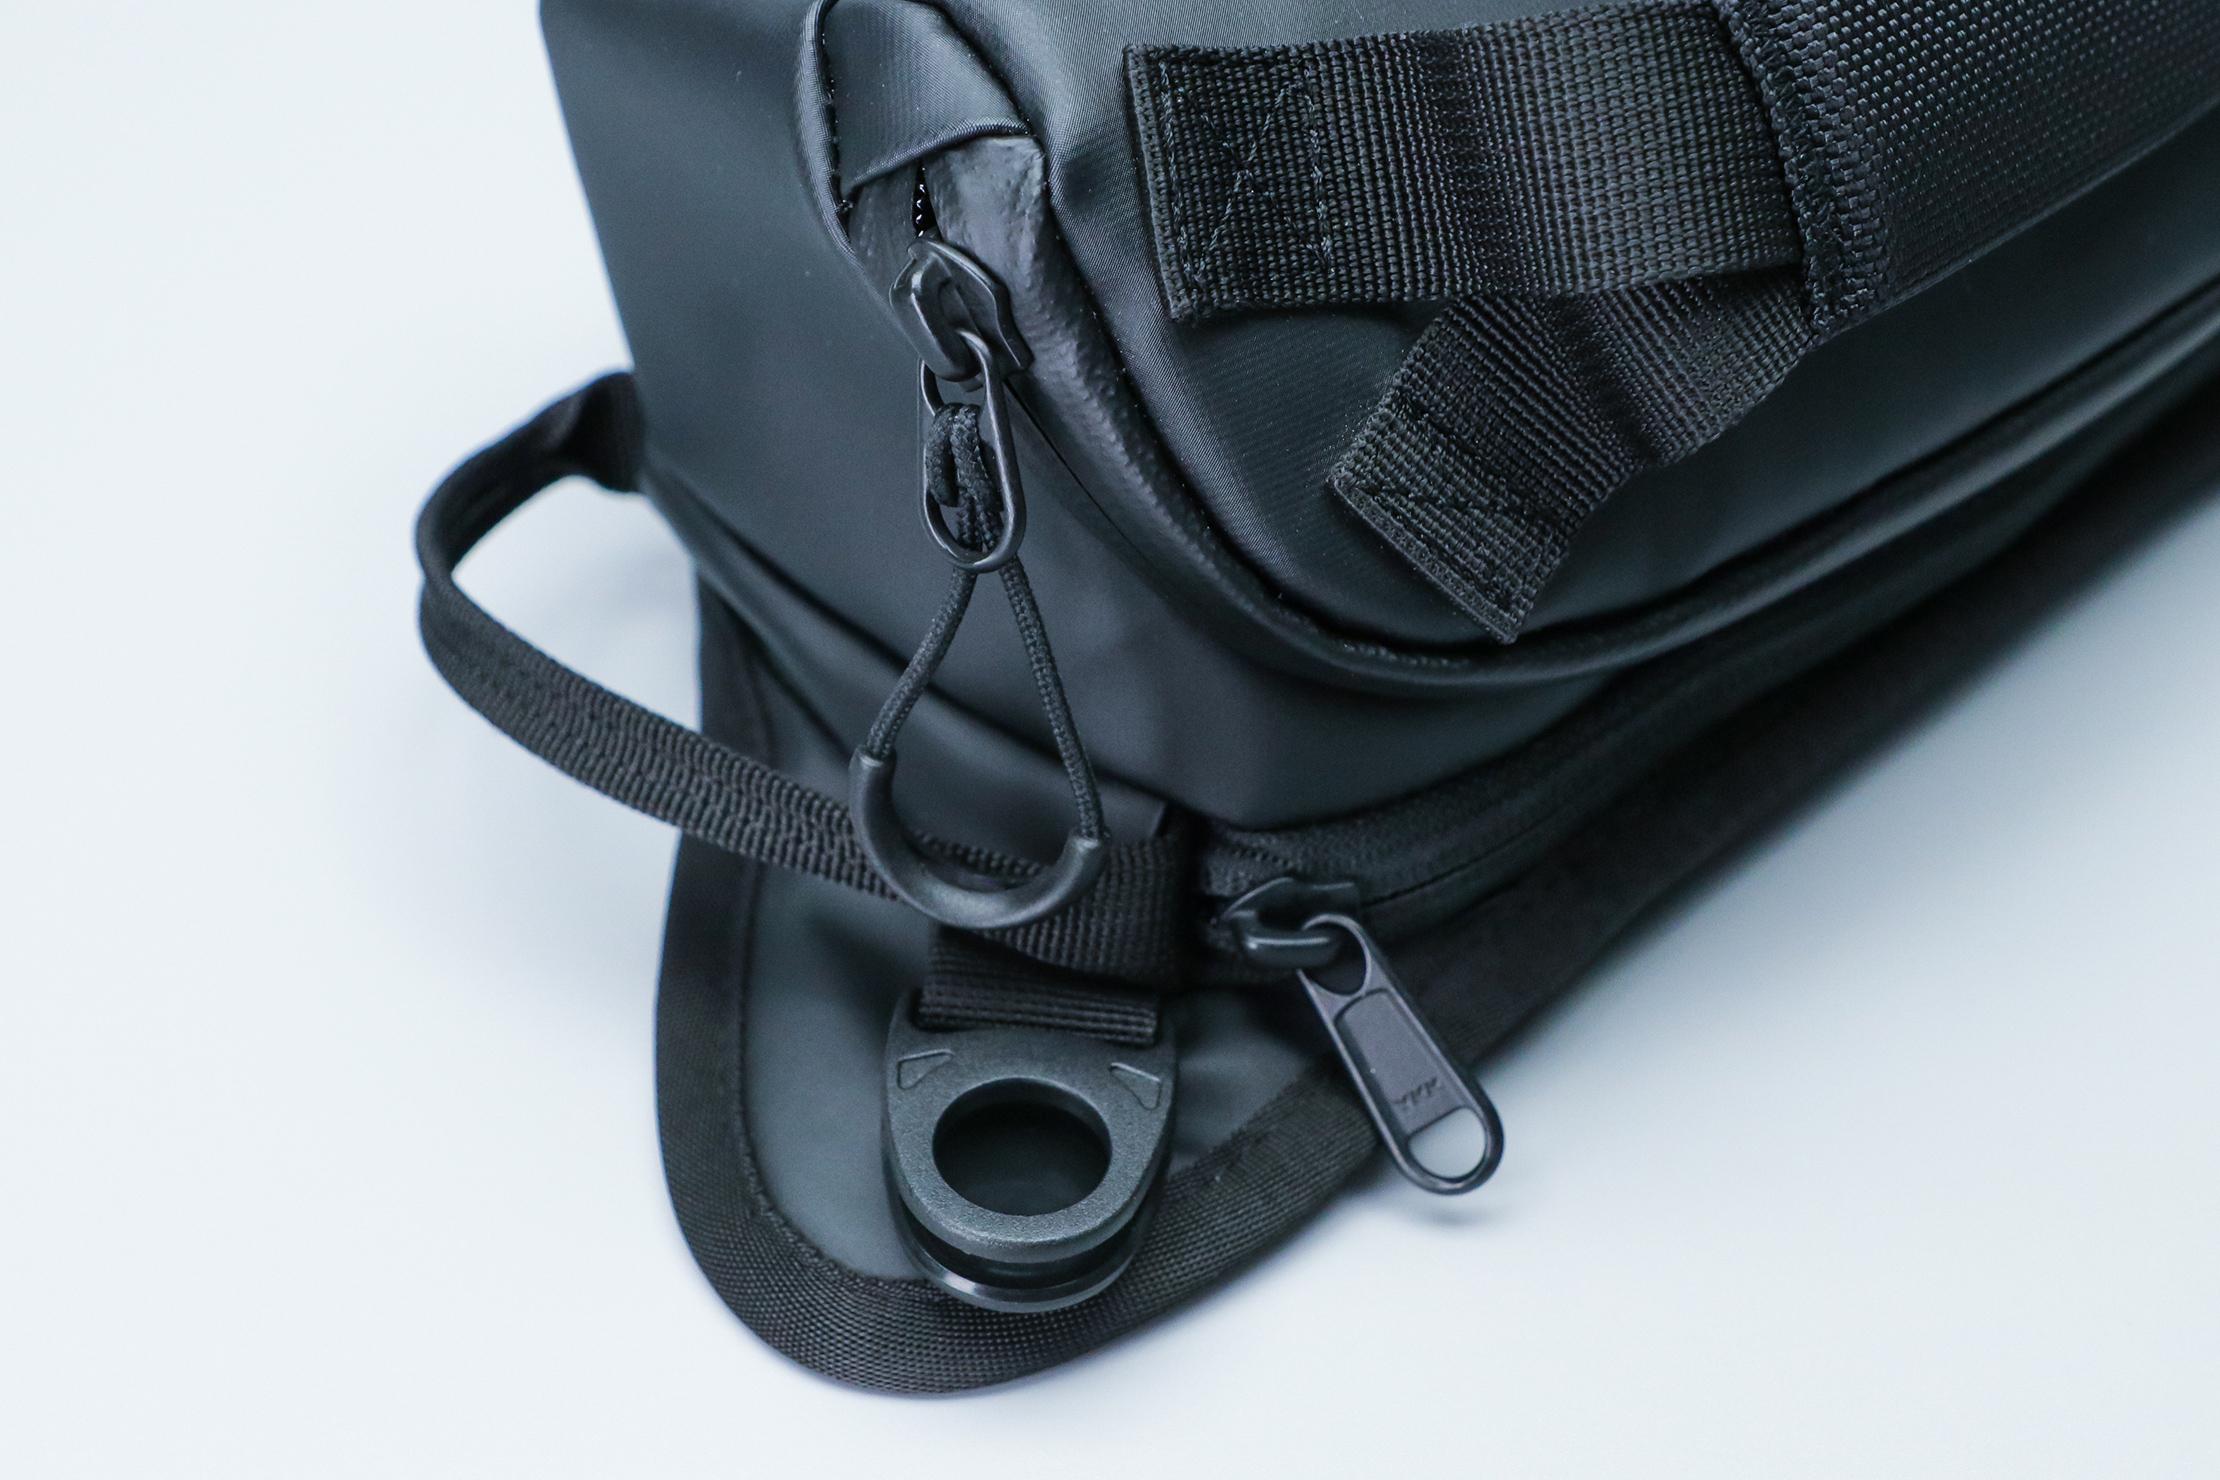 WANDRD ROAM Sling Zippers